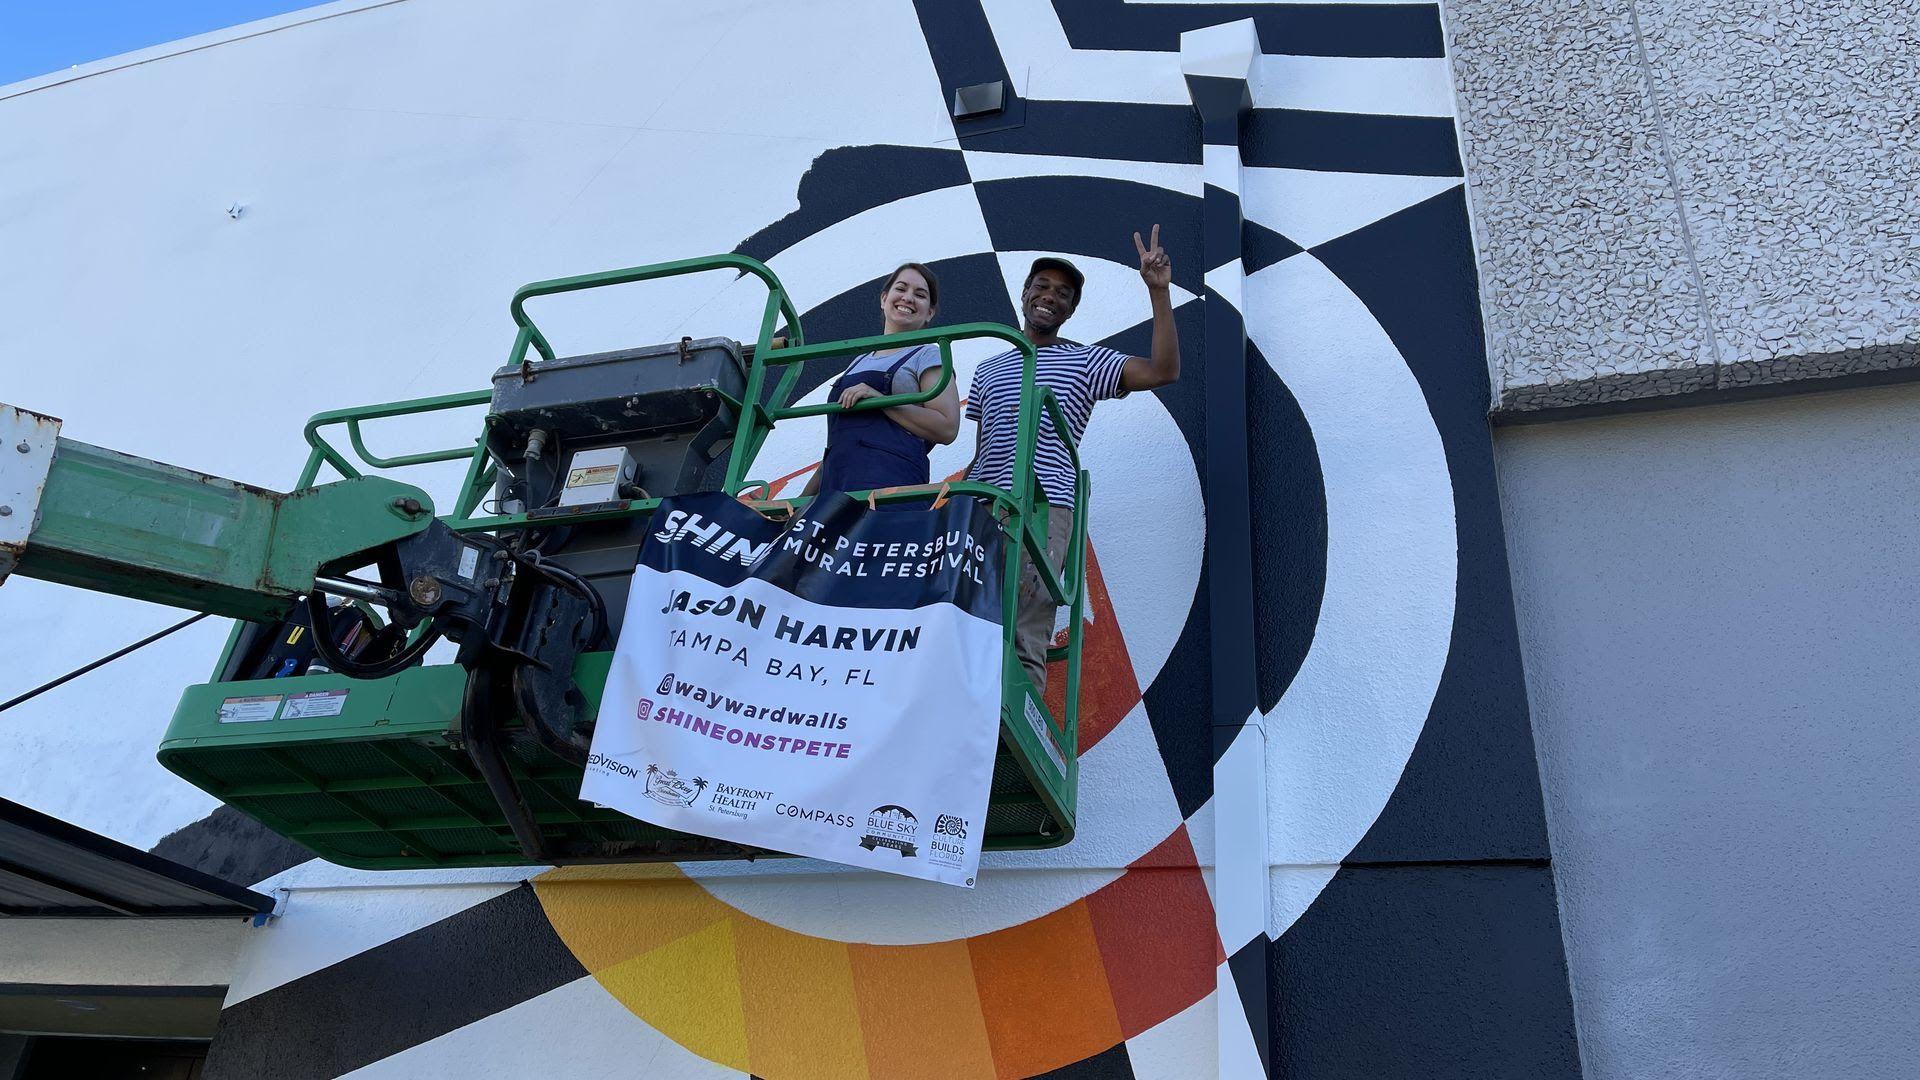 Vera Herrera and Jason Harvin work on his SHINE mural festival piece.